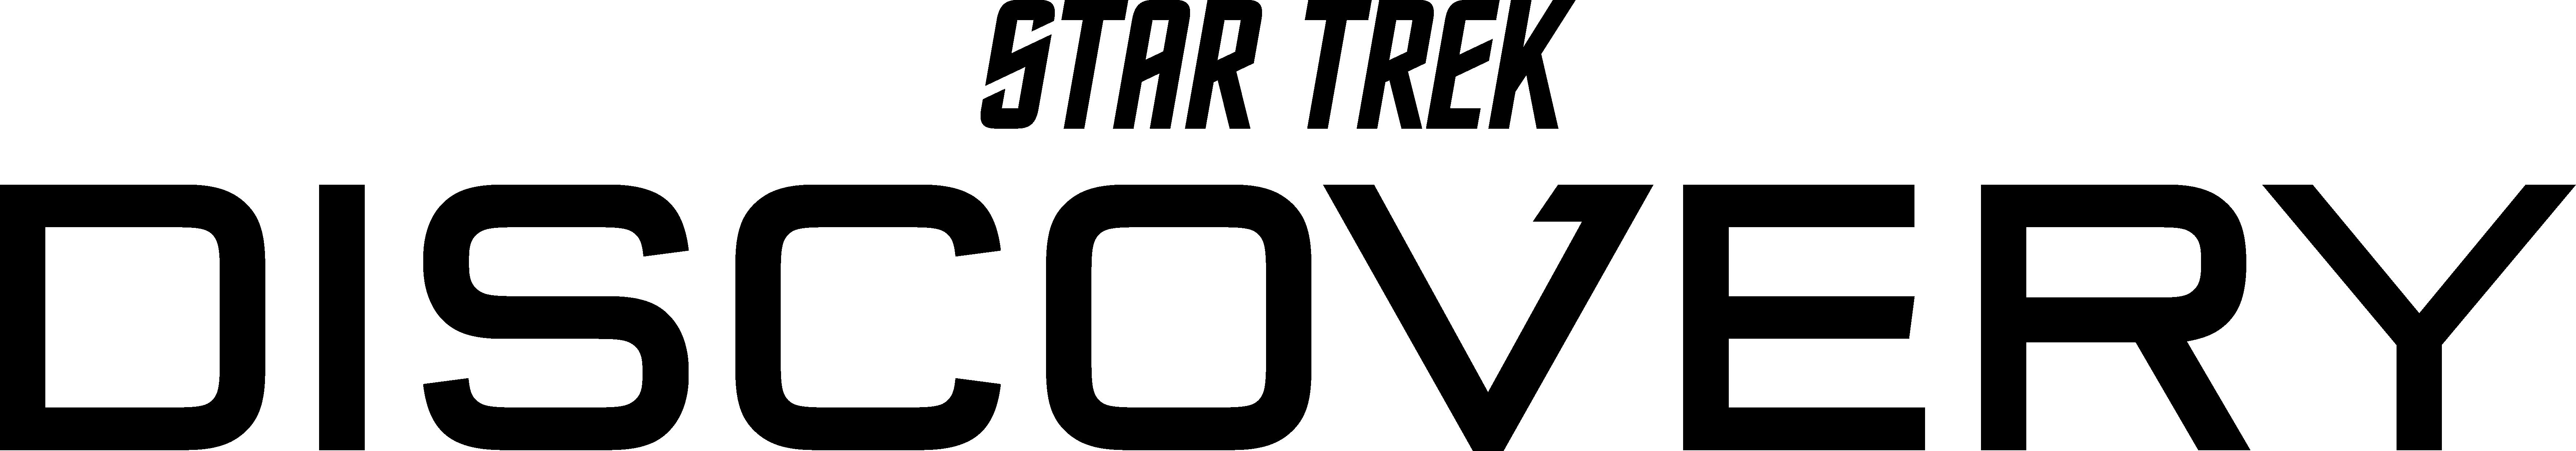 CBS All Access Star Trek logo